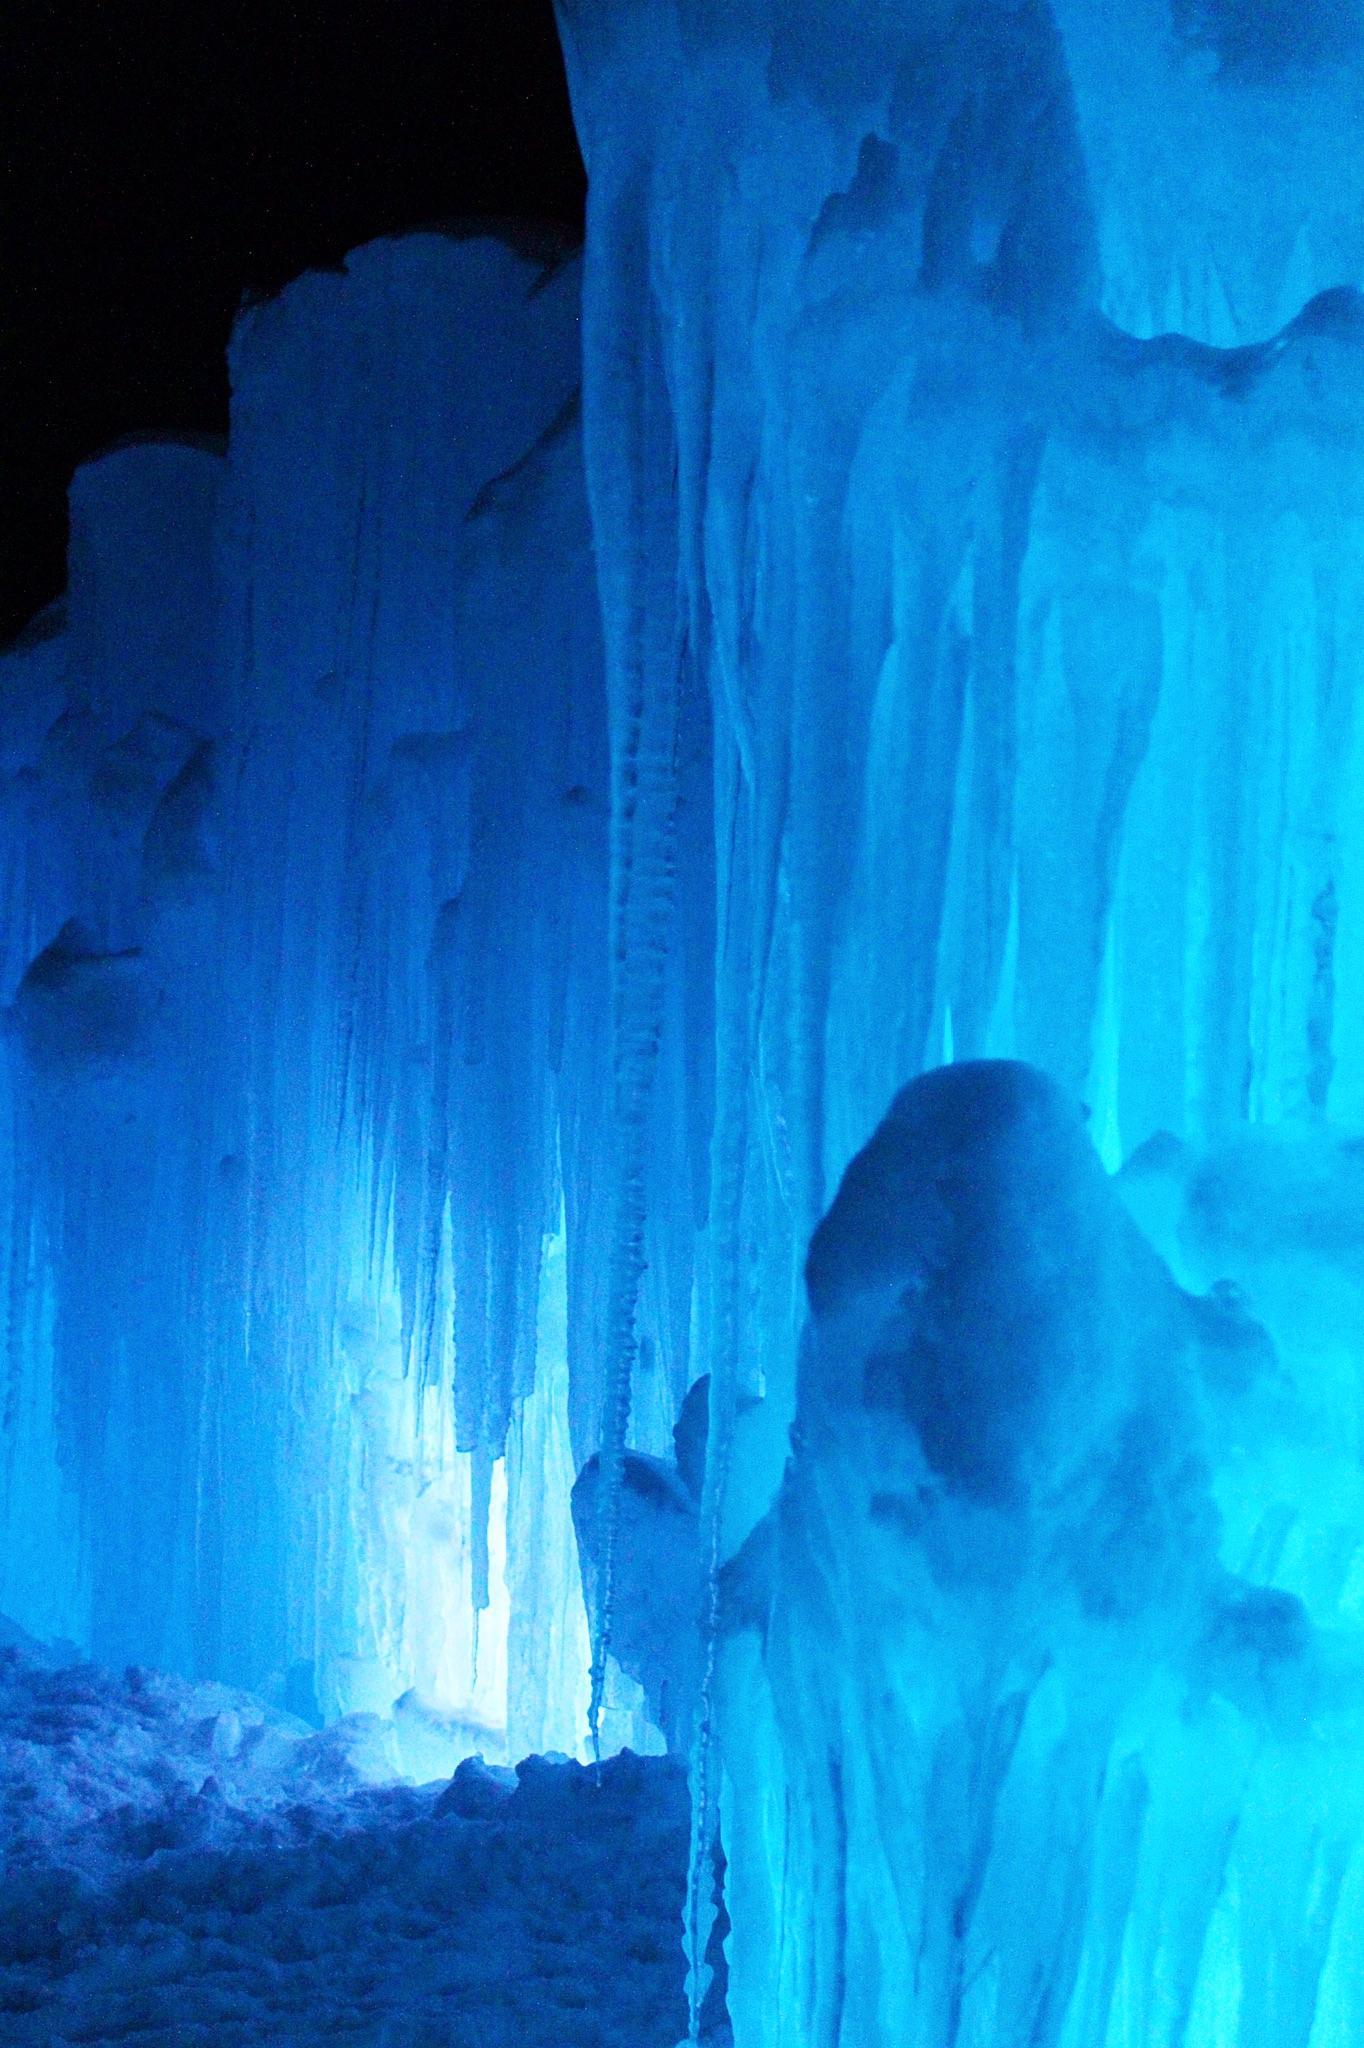 ice-castle-2017.jpg